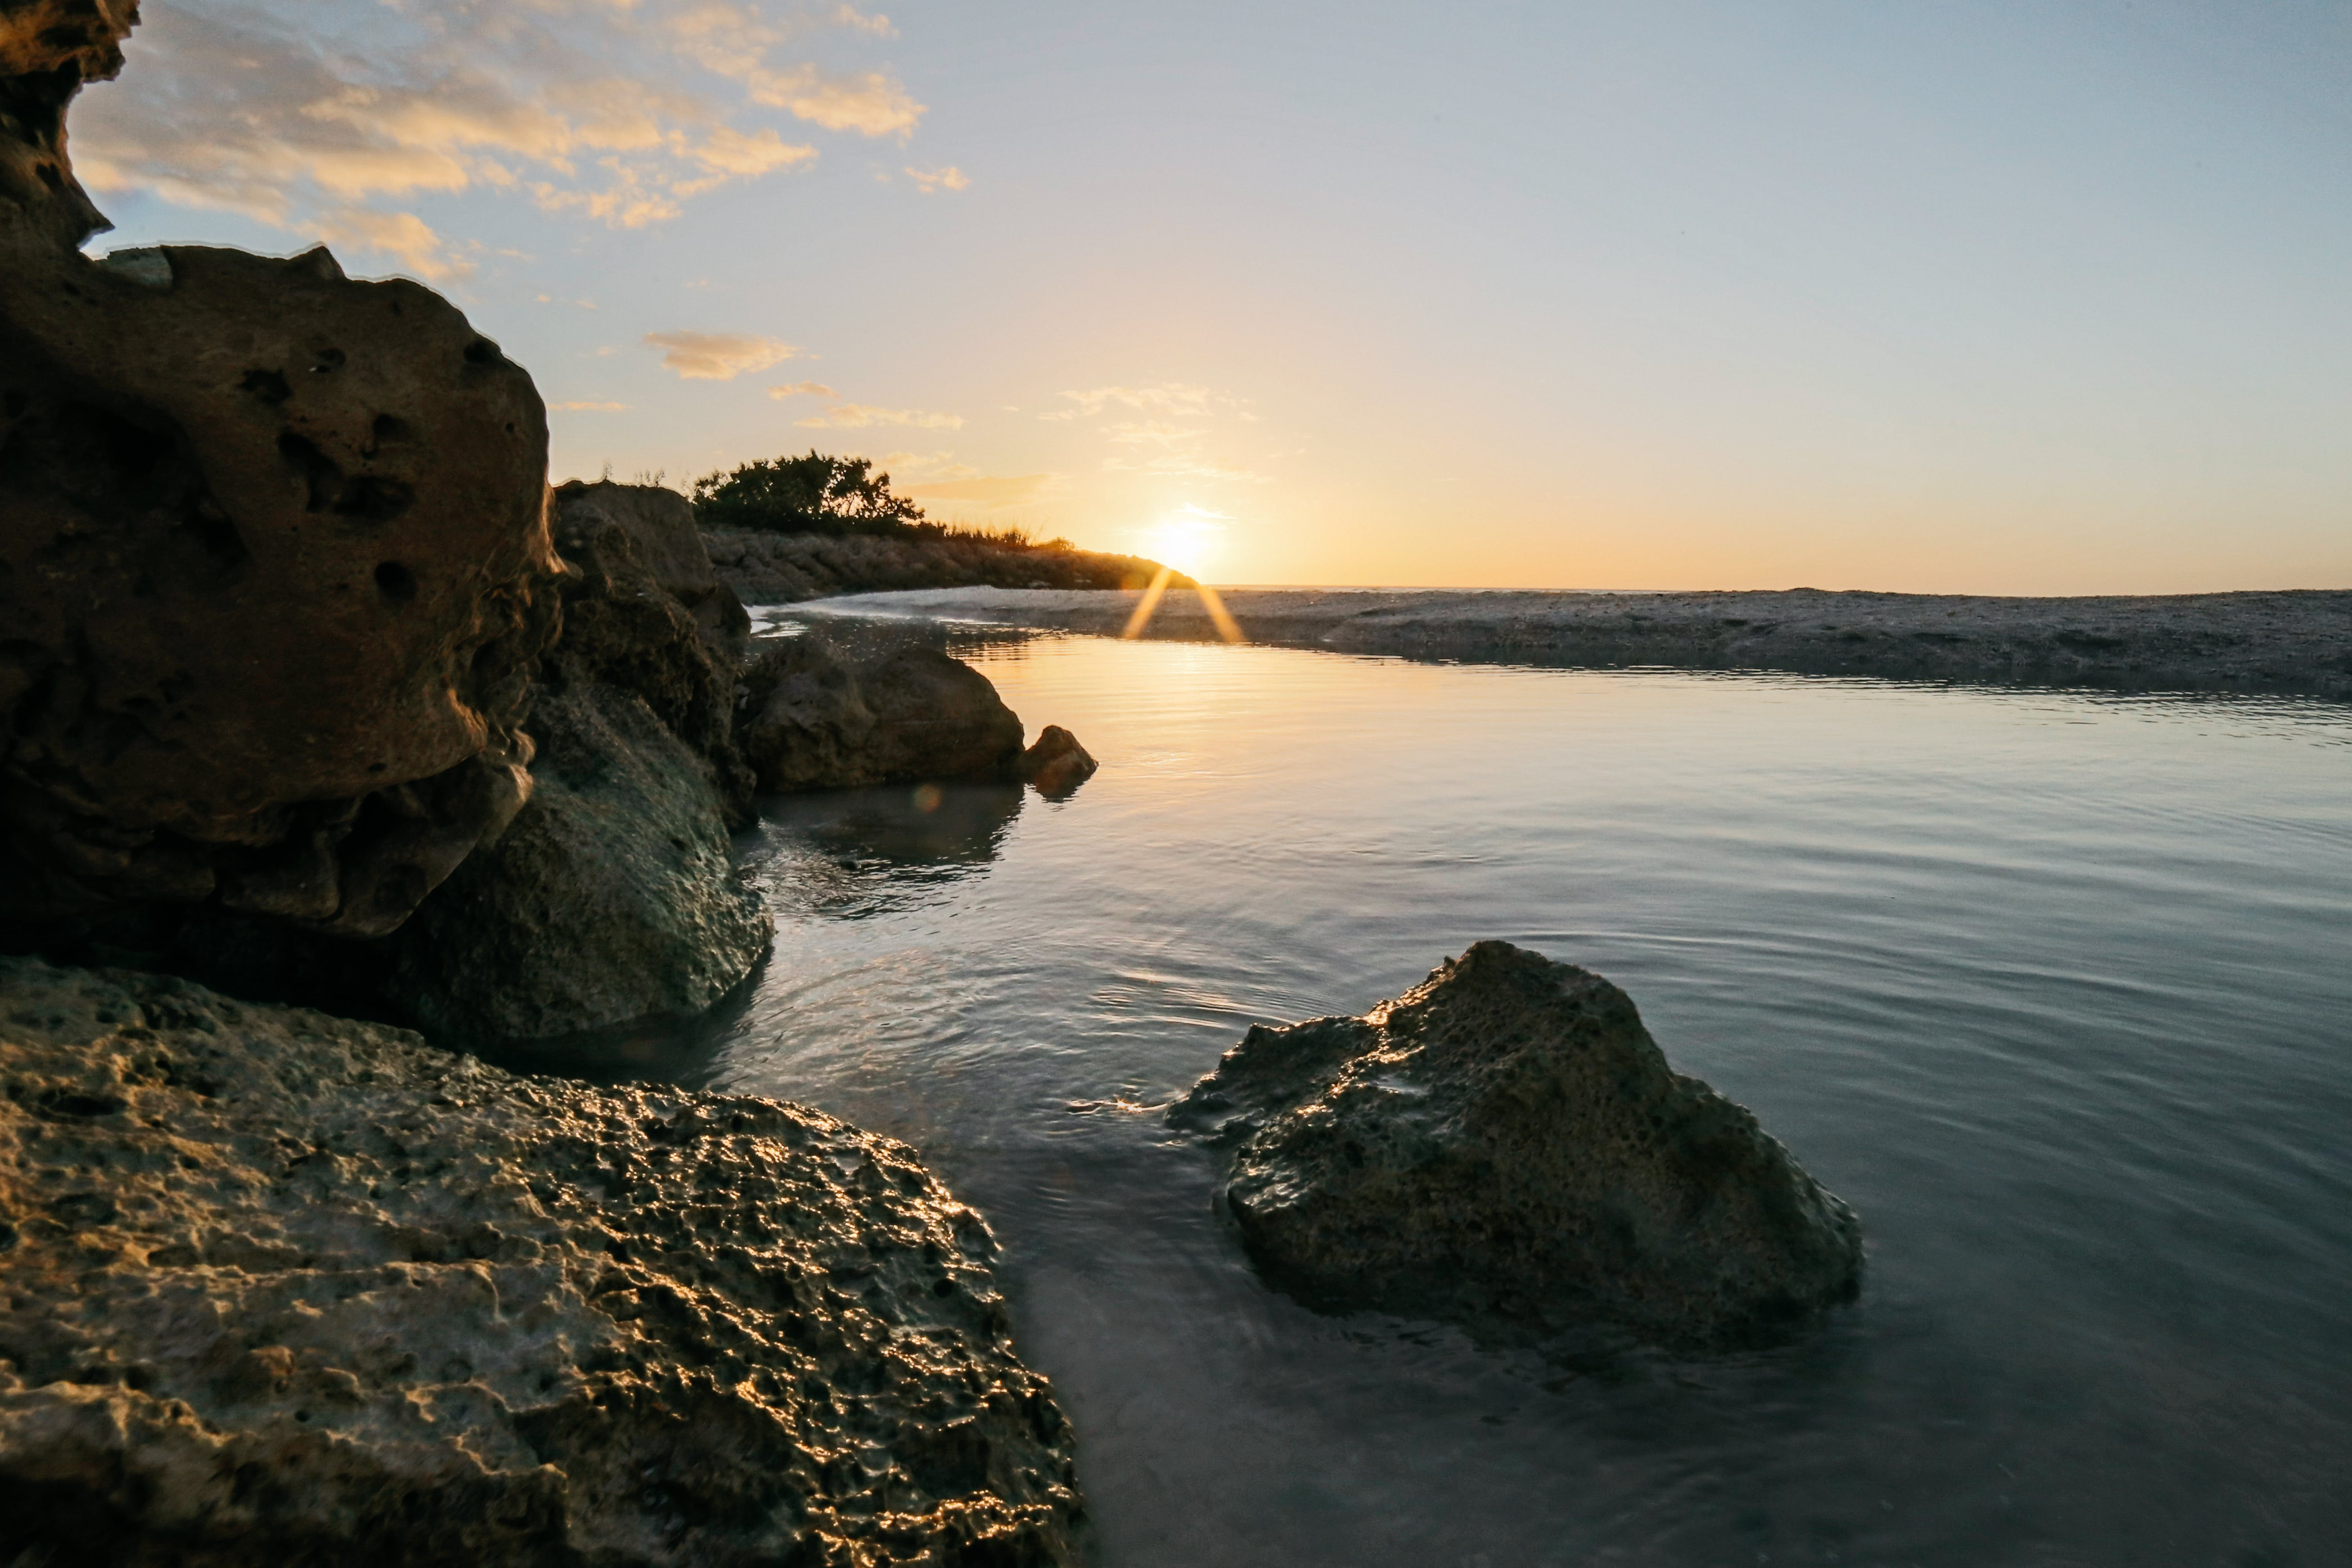 beach, boulders, close -up